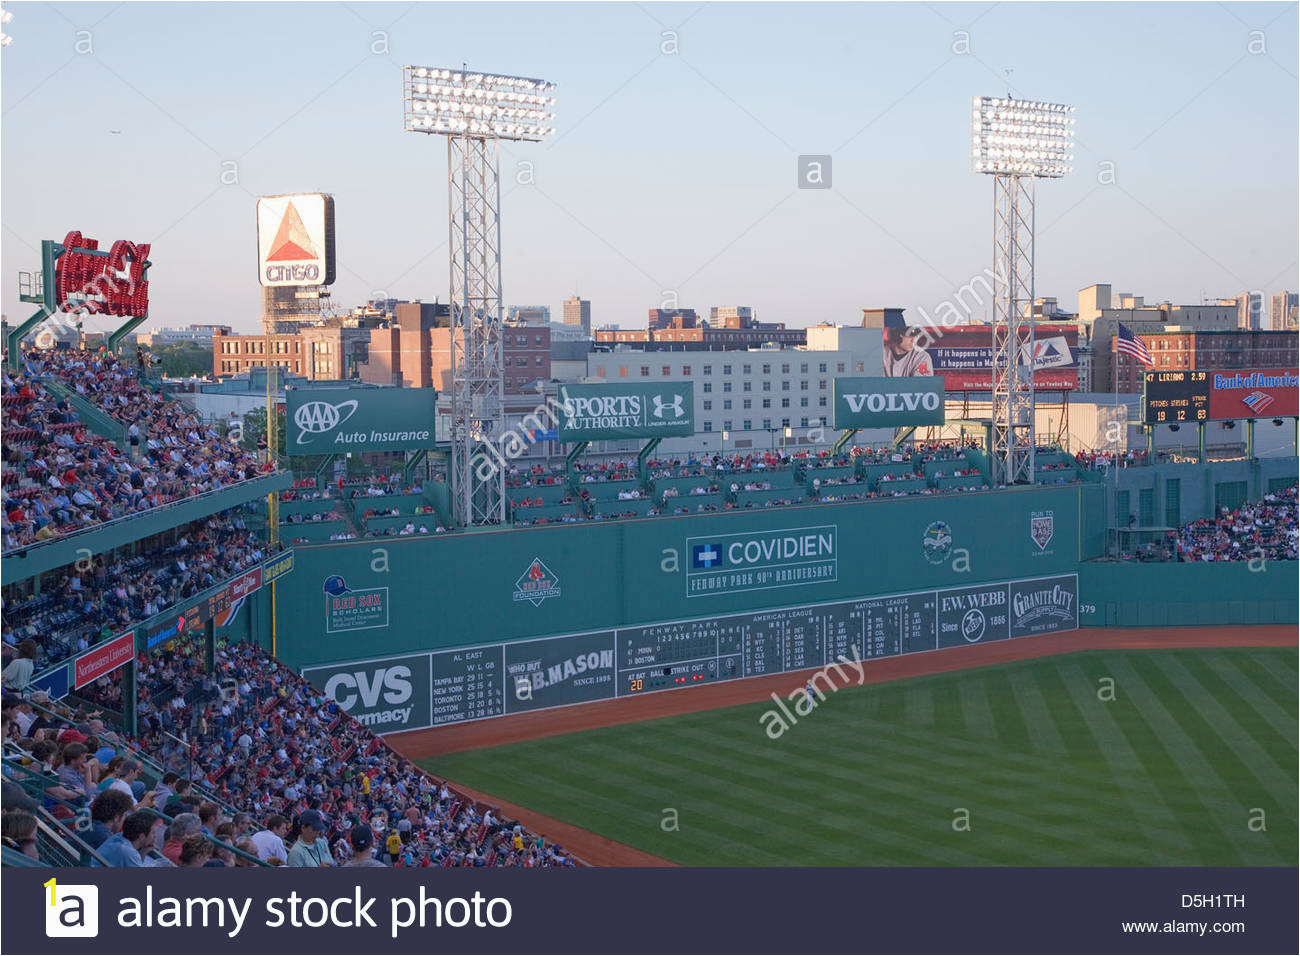 green monster leftfield wand historischen fenway park boston rot sox boston ma usa 20 mai 2010 red sox gegen minnesota zwillinge d5h1th